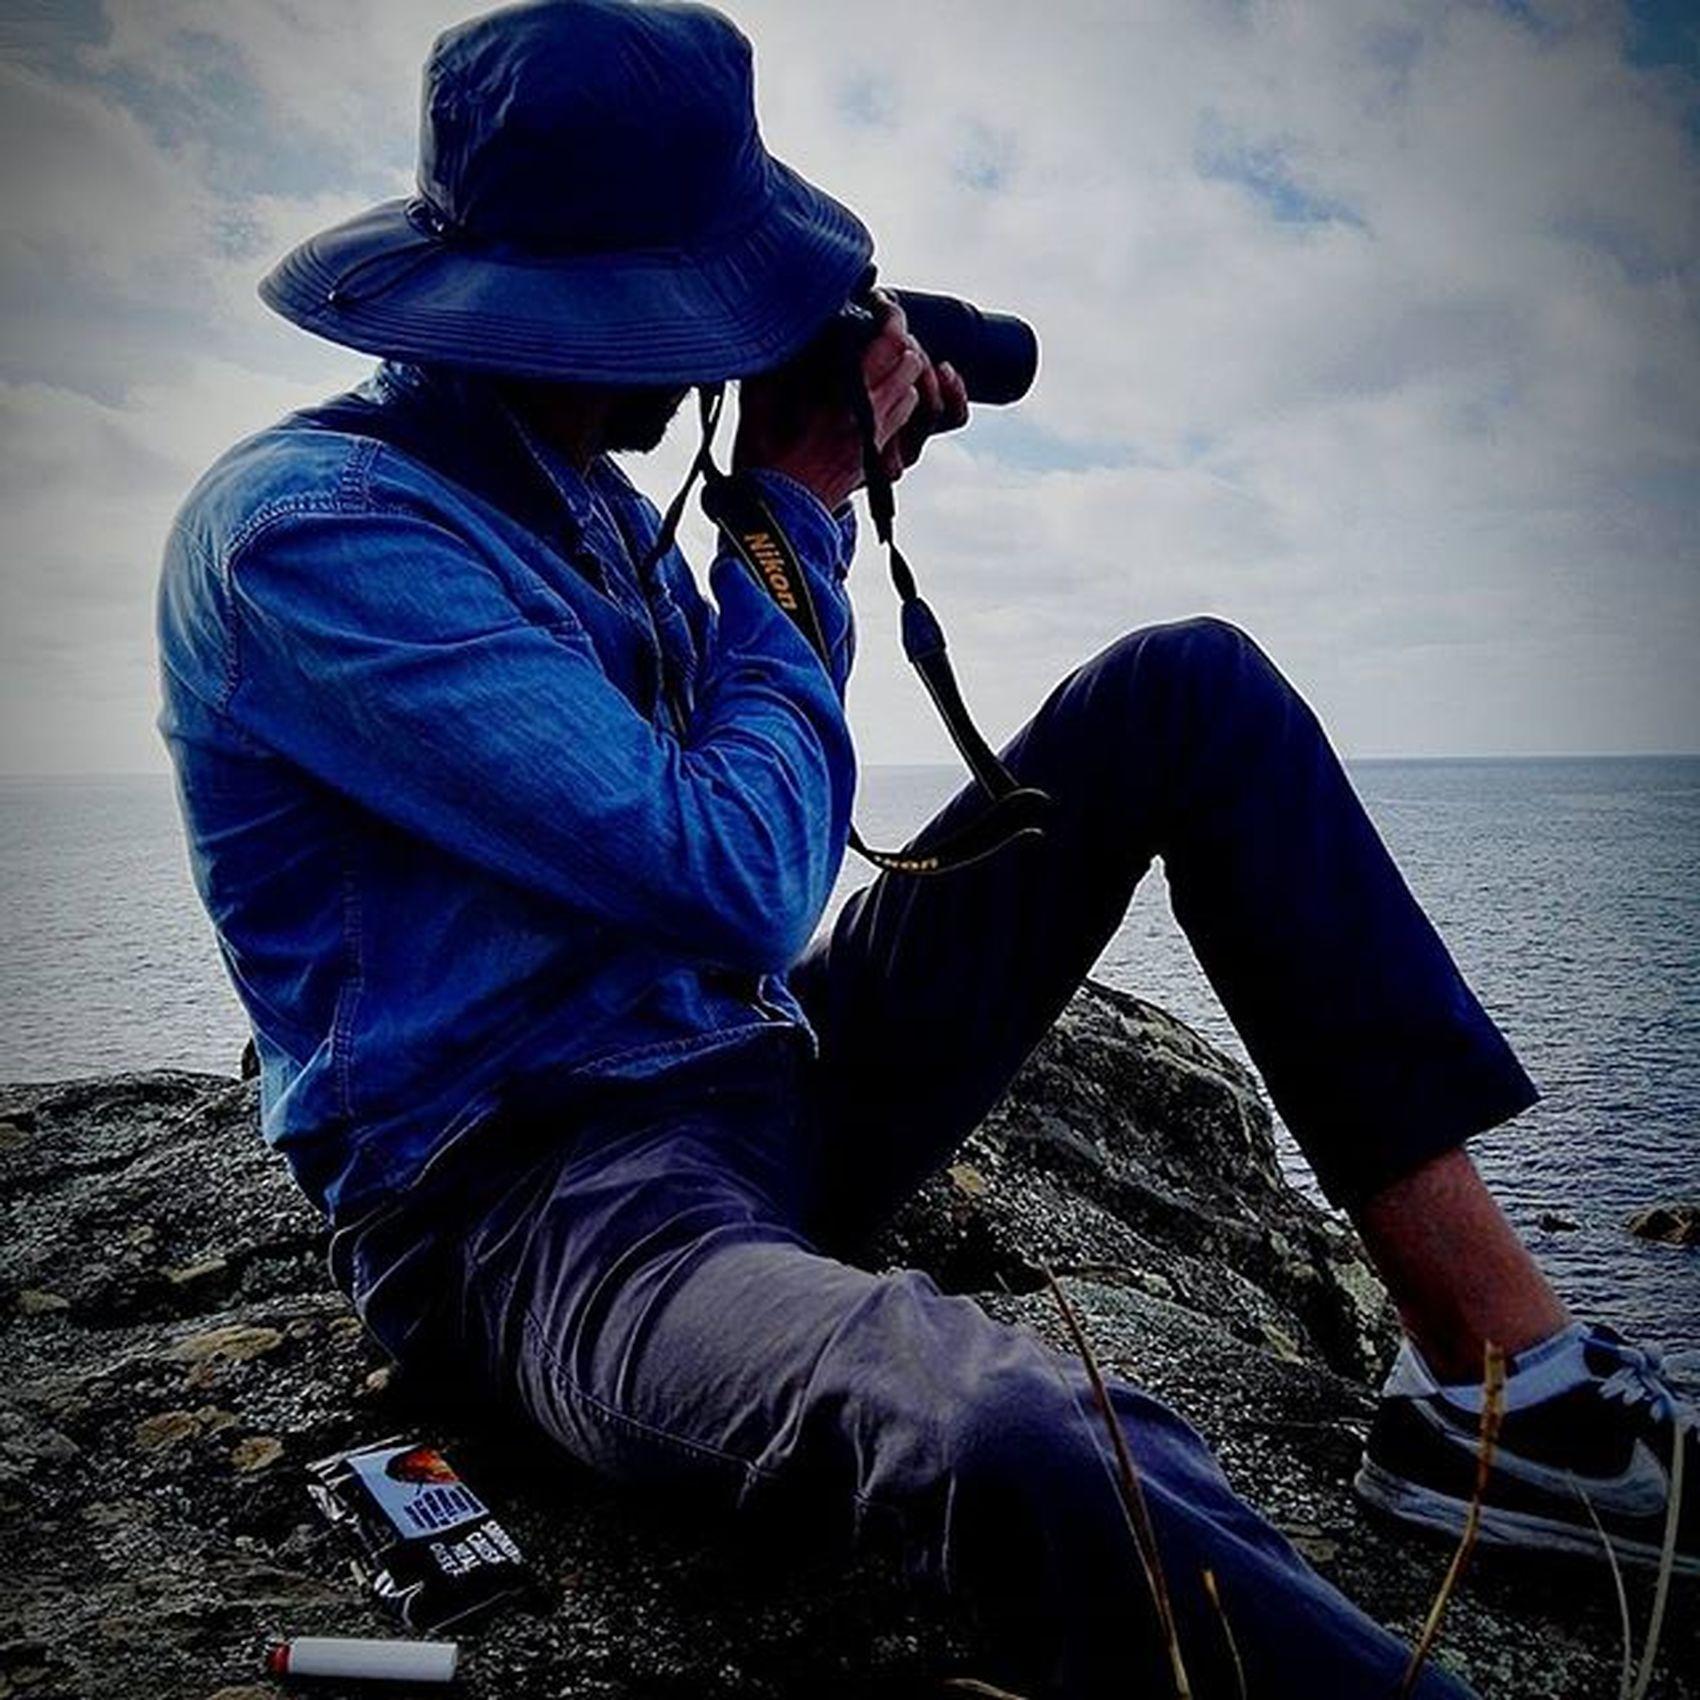 Takephotofromphoto